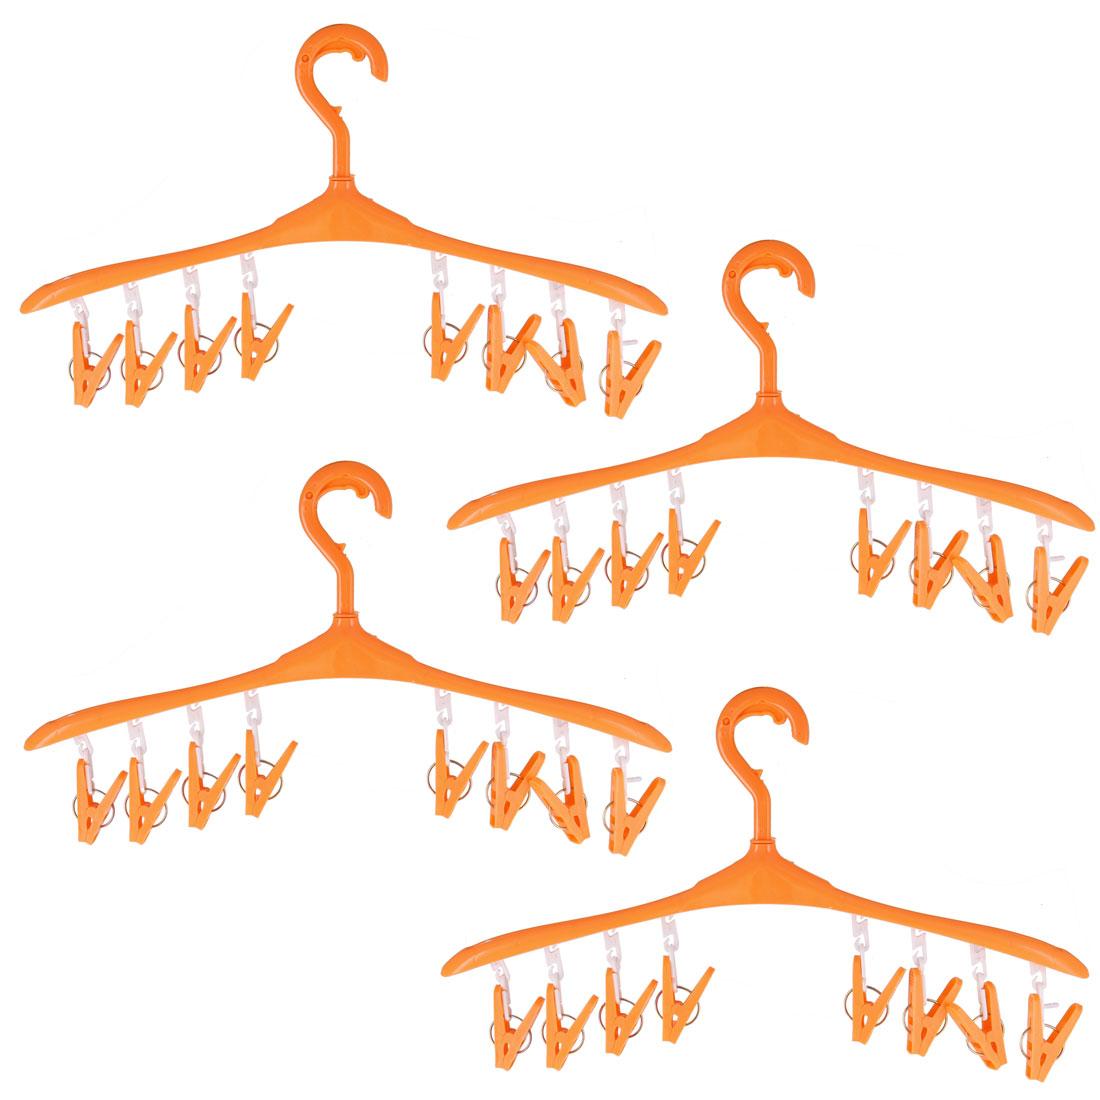 Outdoor Plastic 8 Clips Nonslip Drying Rack Clothes Socks Pants Hanger Orange 4pcs